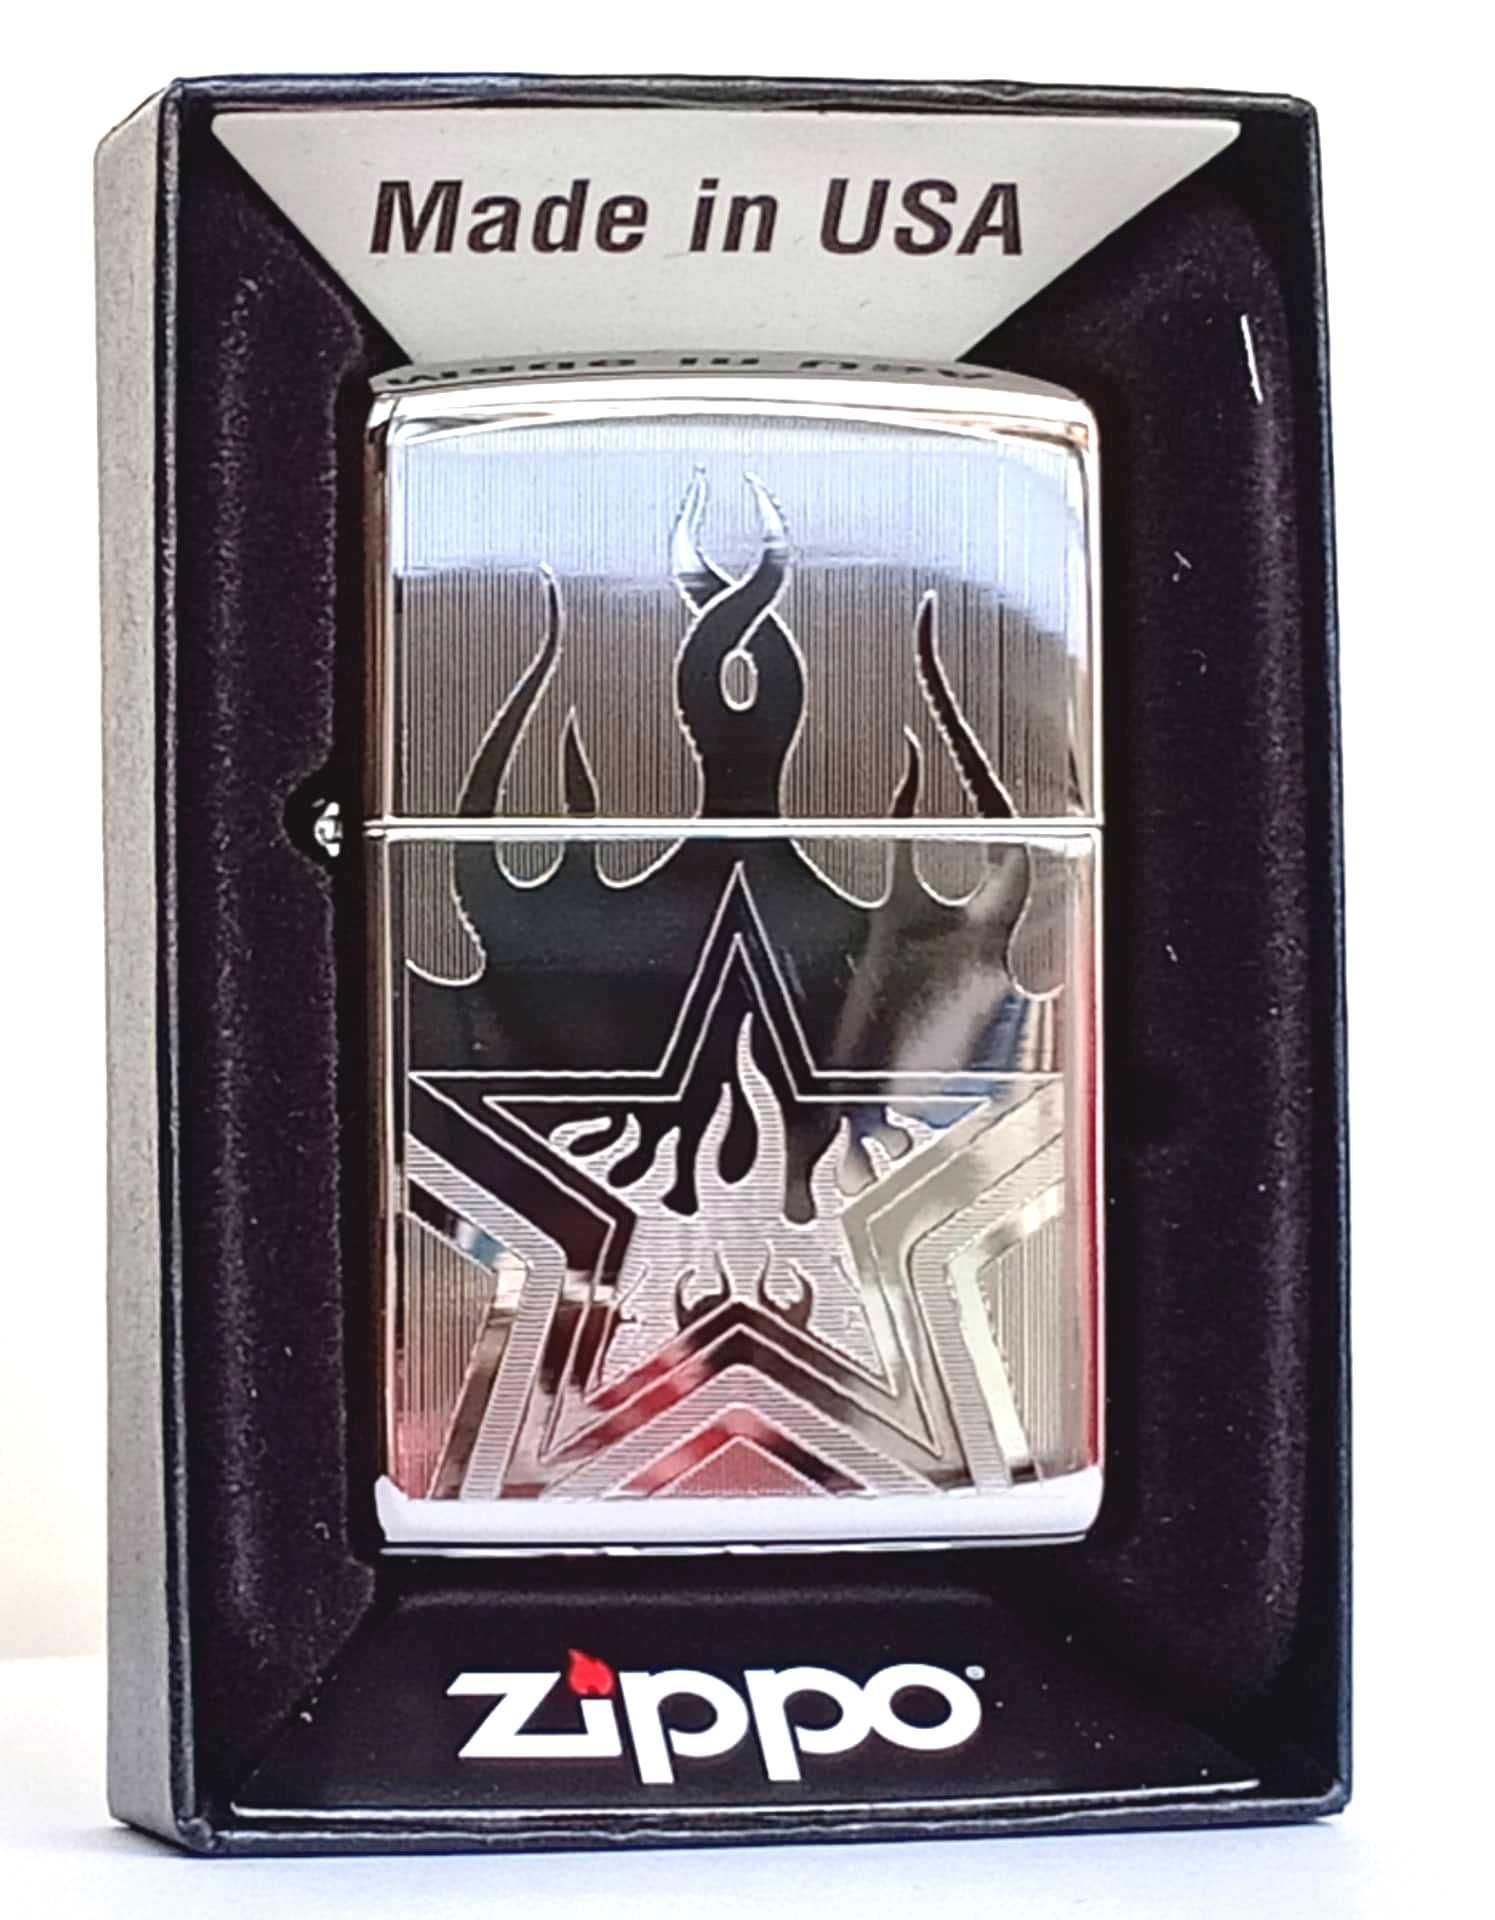 Zippo bong trang khac 1 mat hinh ngoi sao Z801